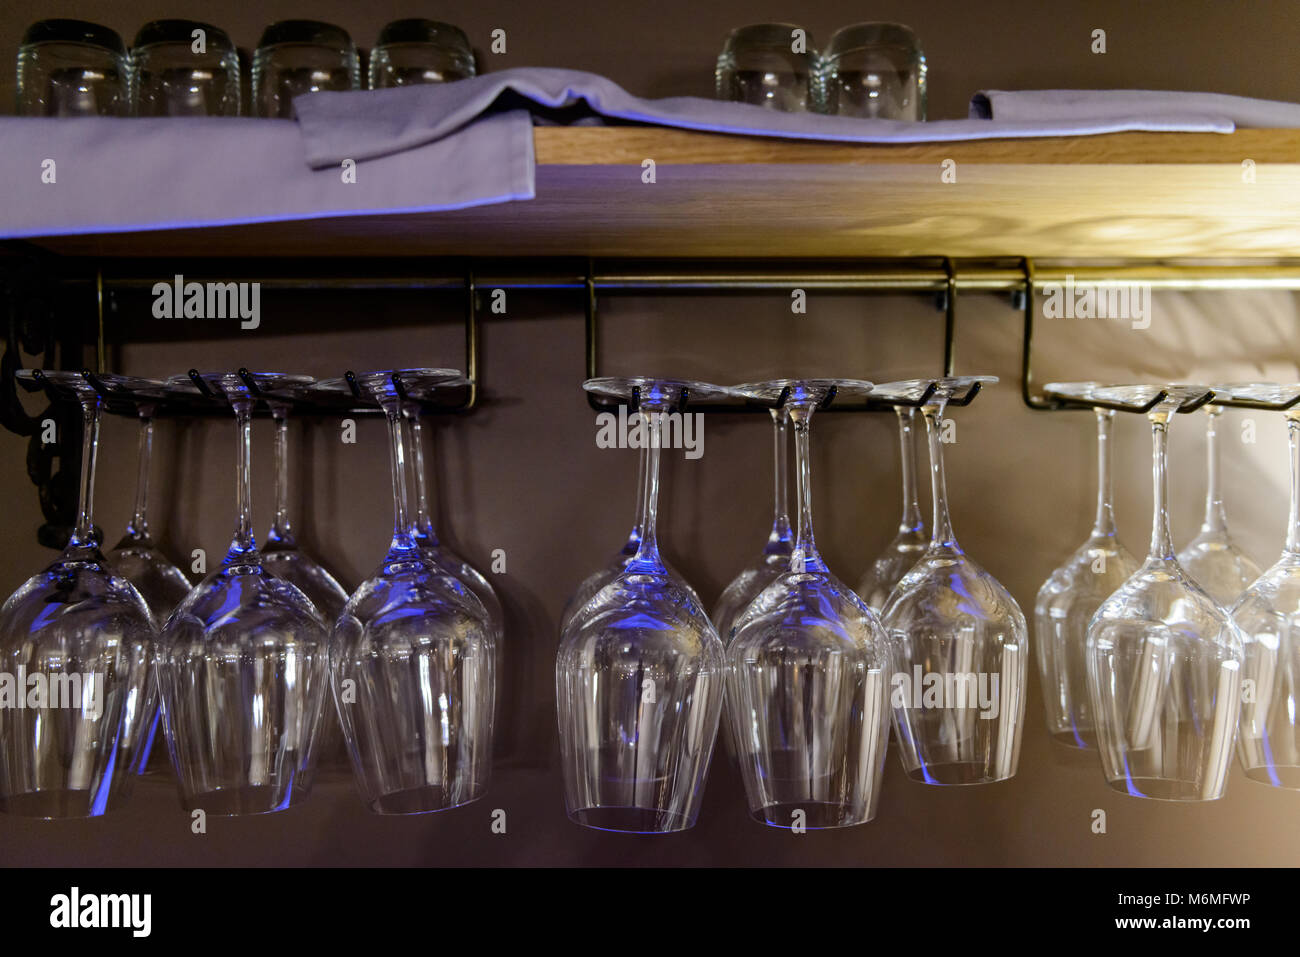 Top Gläser über Bar Regal aufhängen Stockfoto, Bild: 176243138 - Alamy RG76